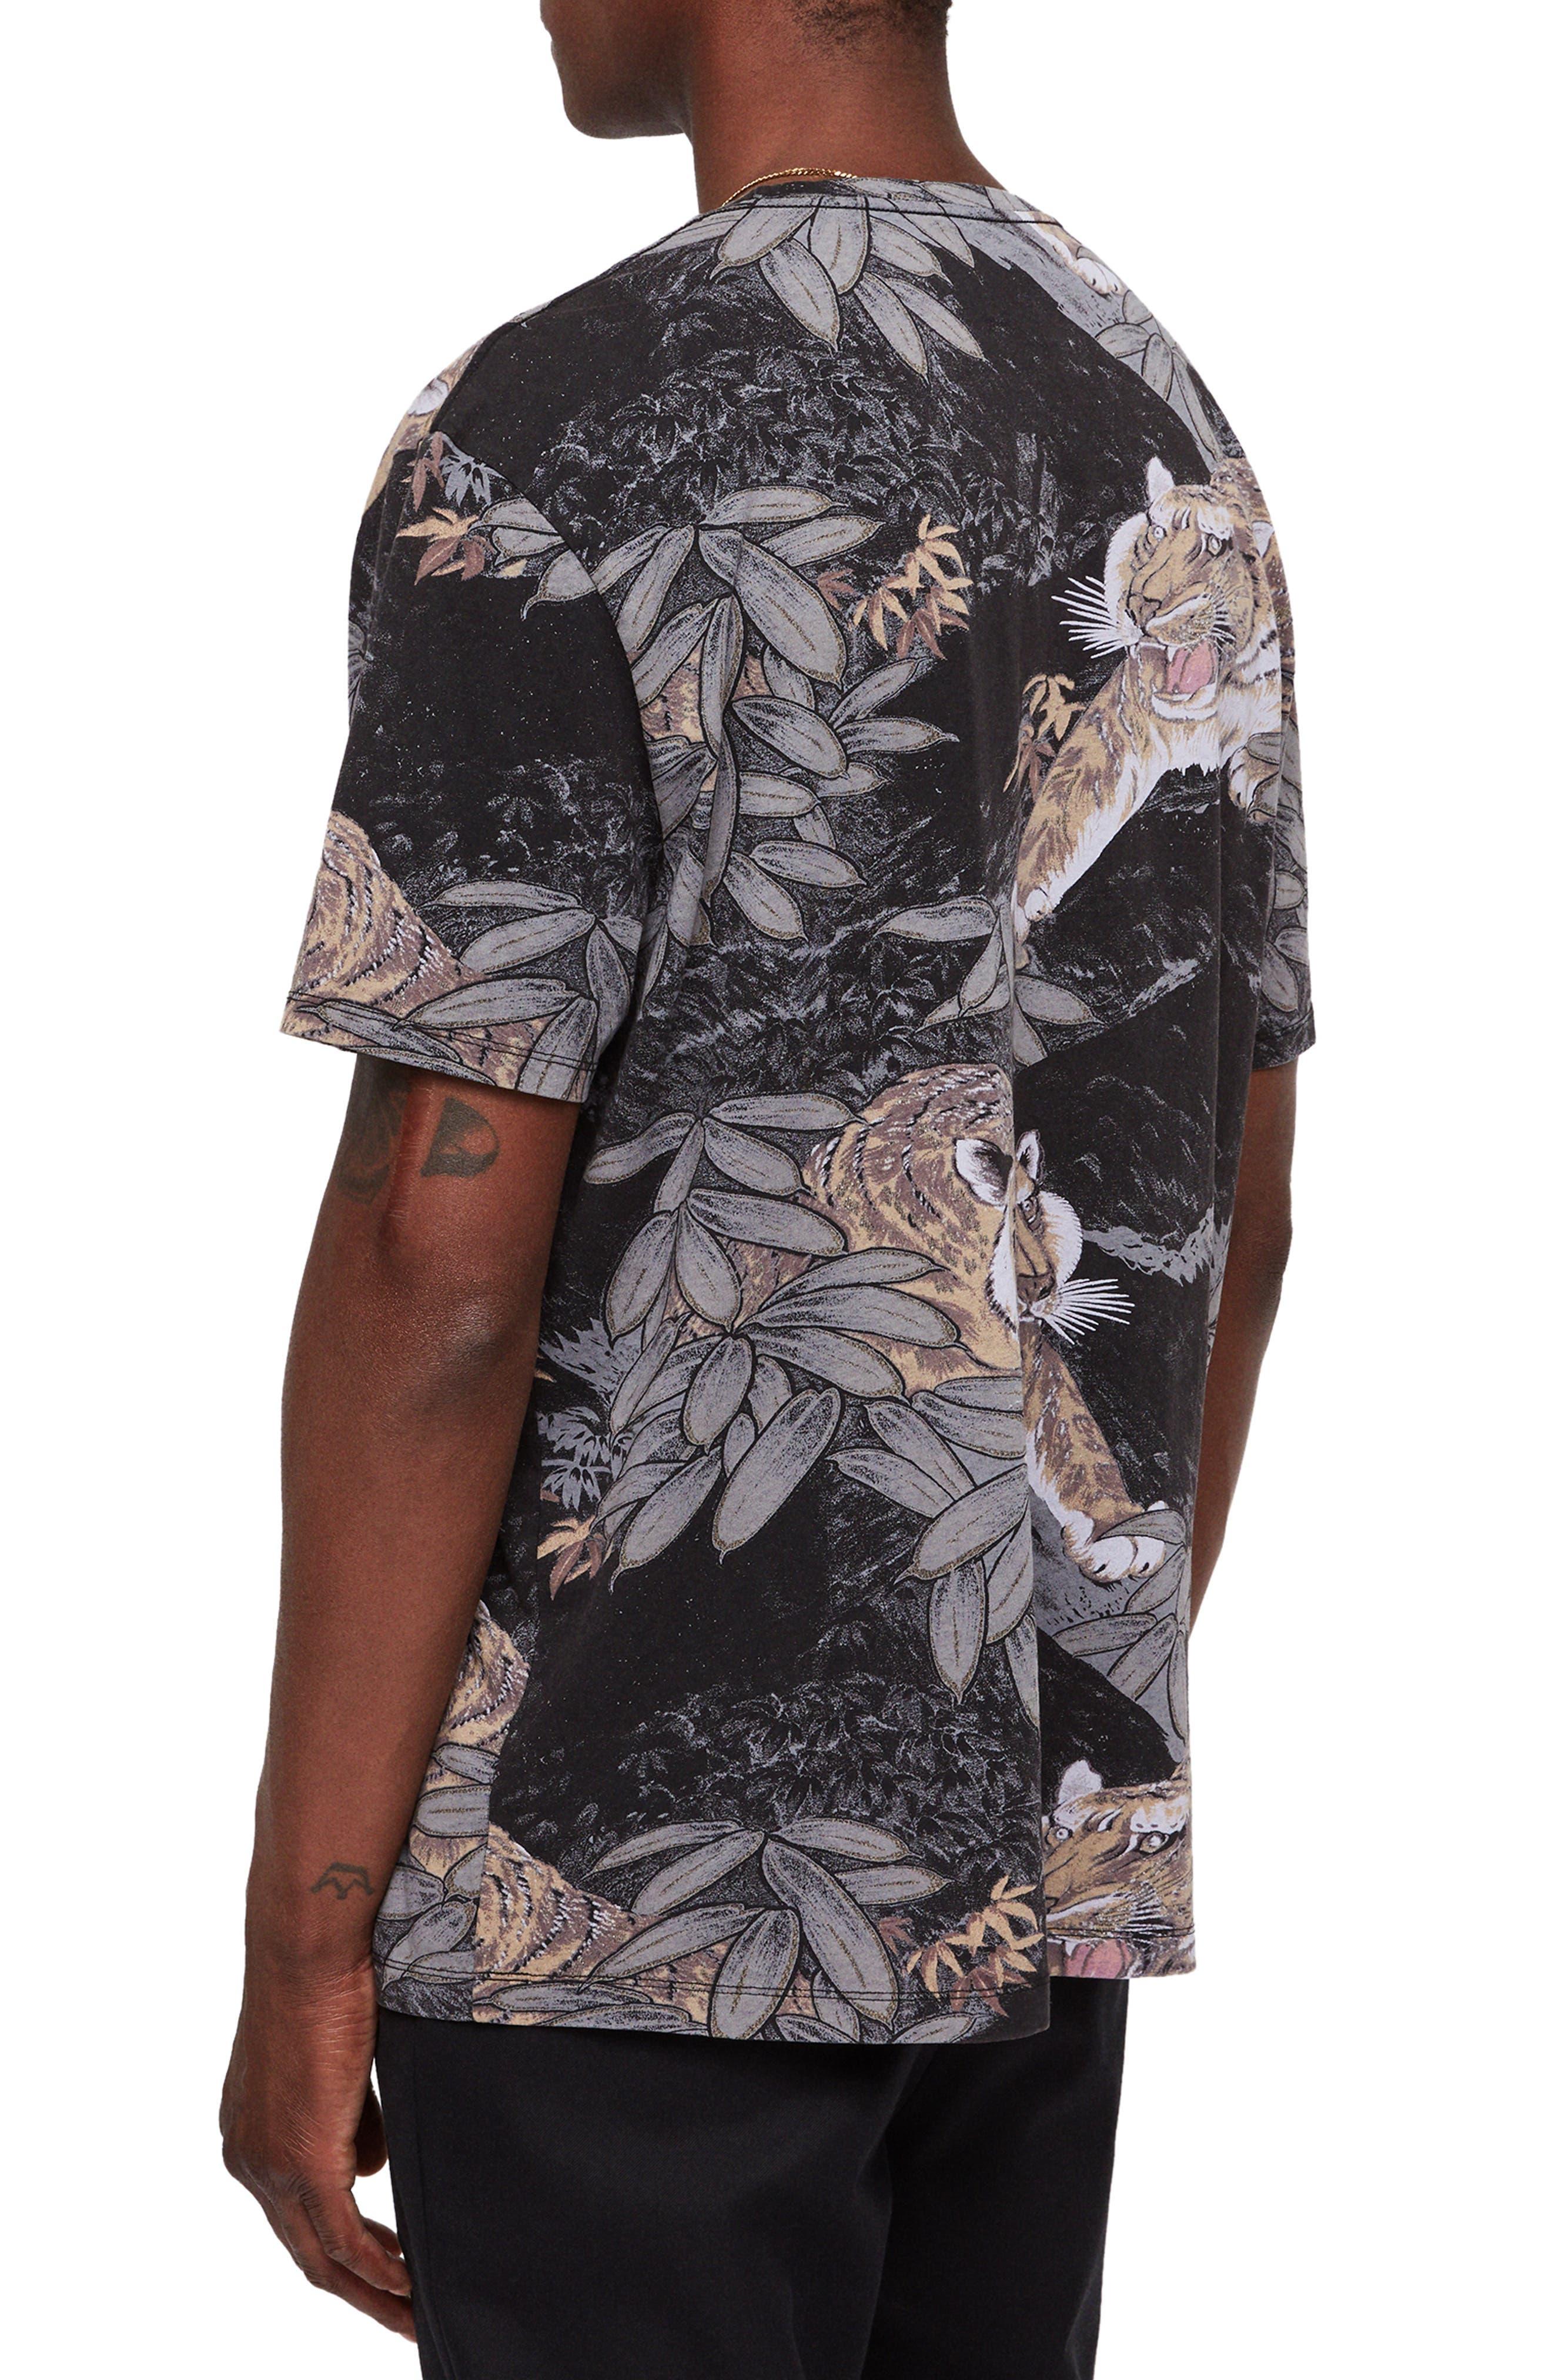 Chokai Slim Fit T-Shirt,                             Alternate thumbnail 2, color,                             VINTAGE BLACK